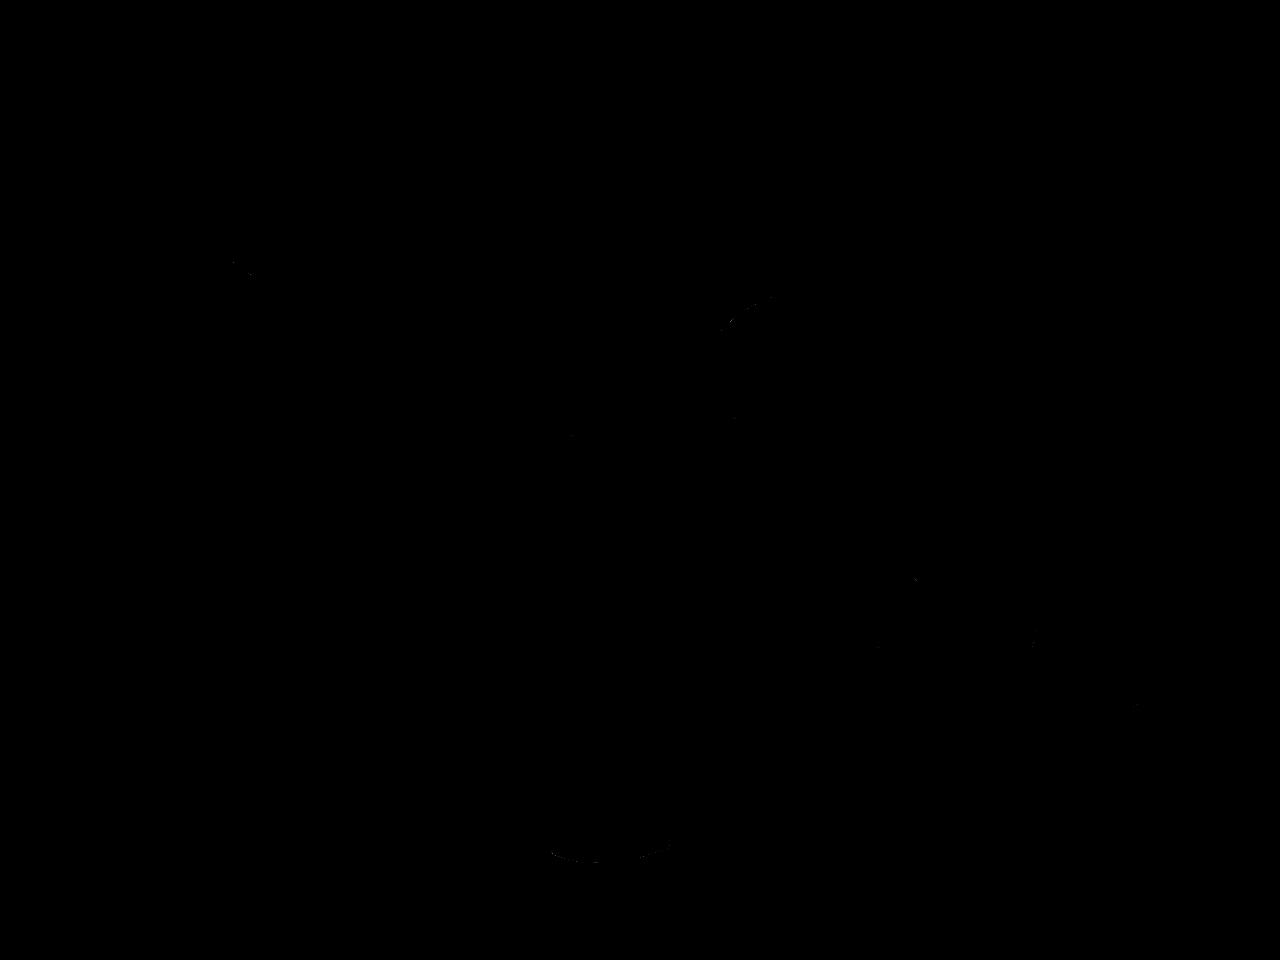 missewecomic-owlettas